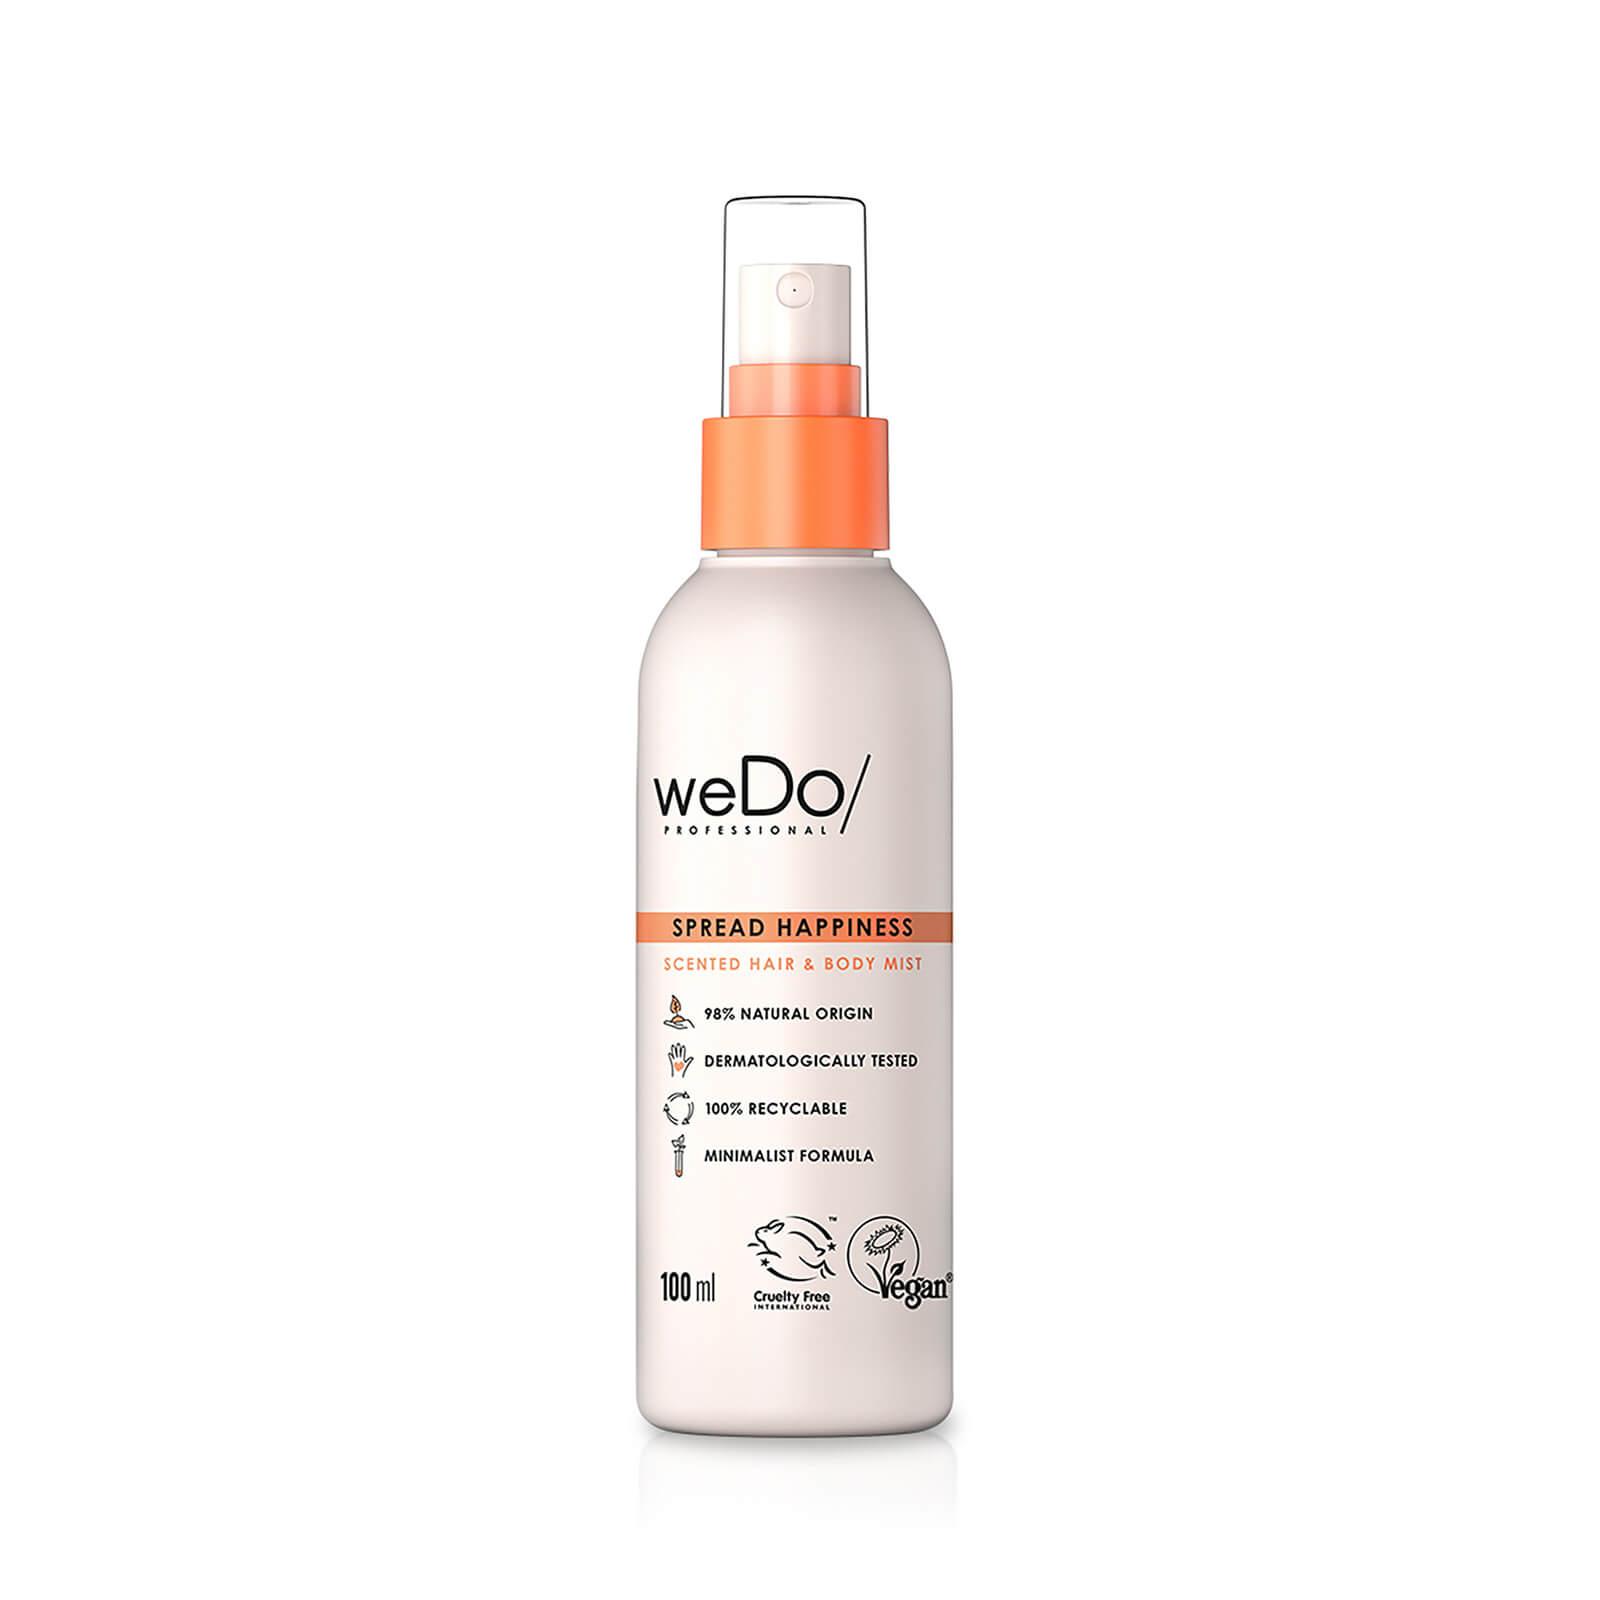 weDo/ Professional Hair and Body Mist 100ml